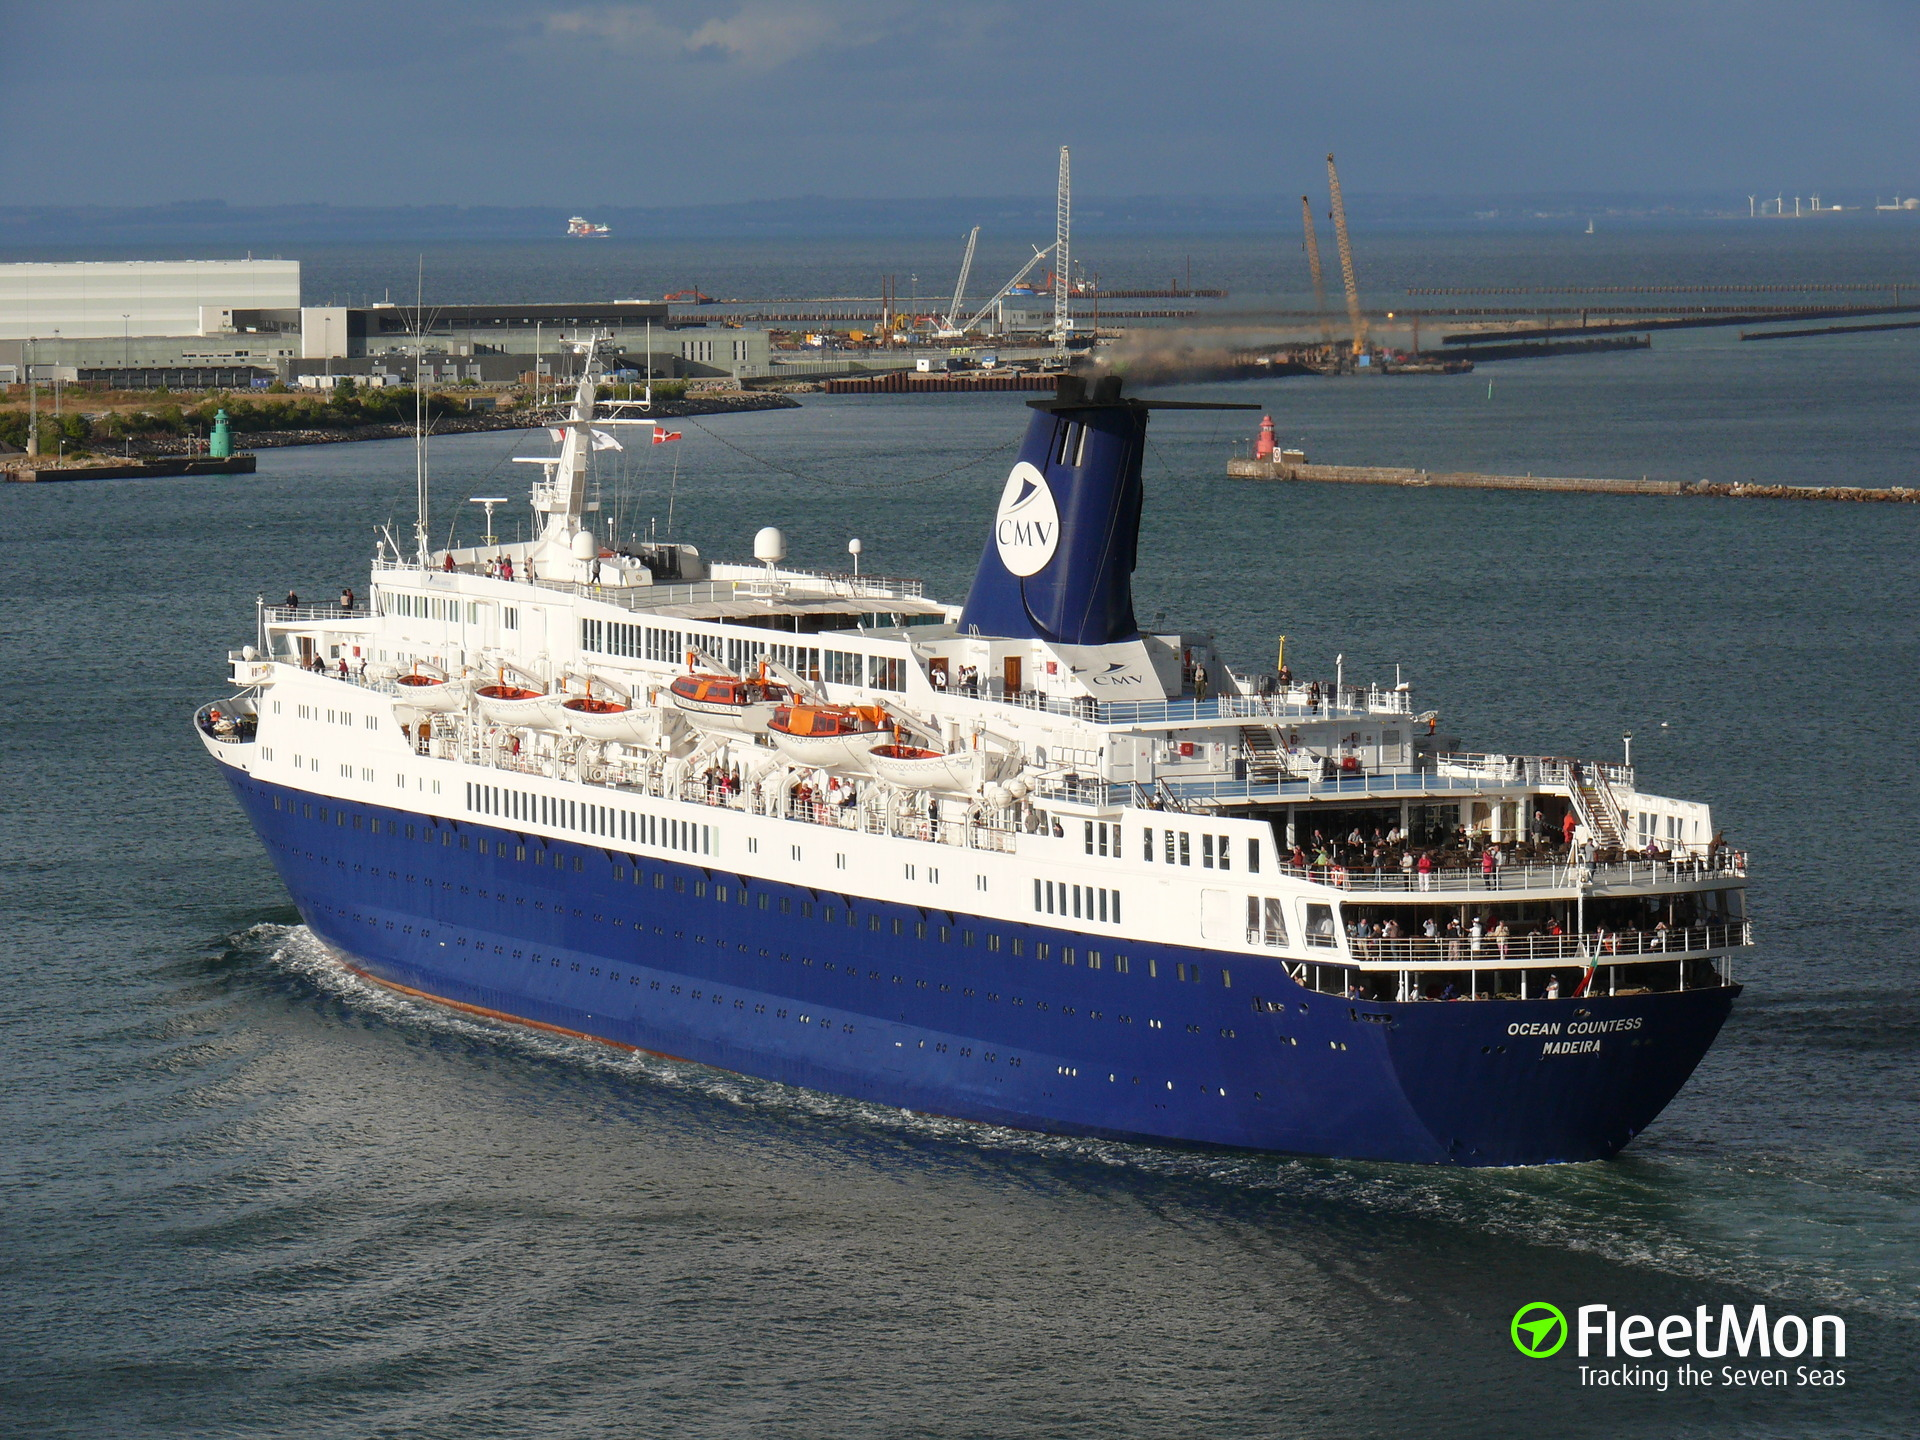 Cruiser liner Ocean Countess on fire, Greece